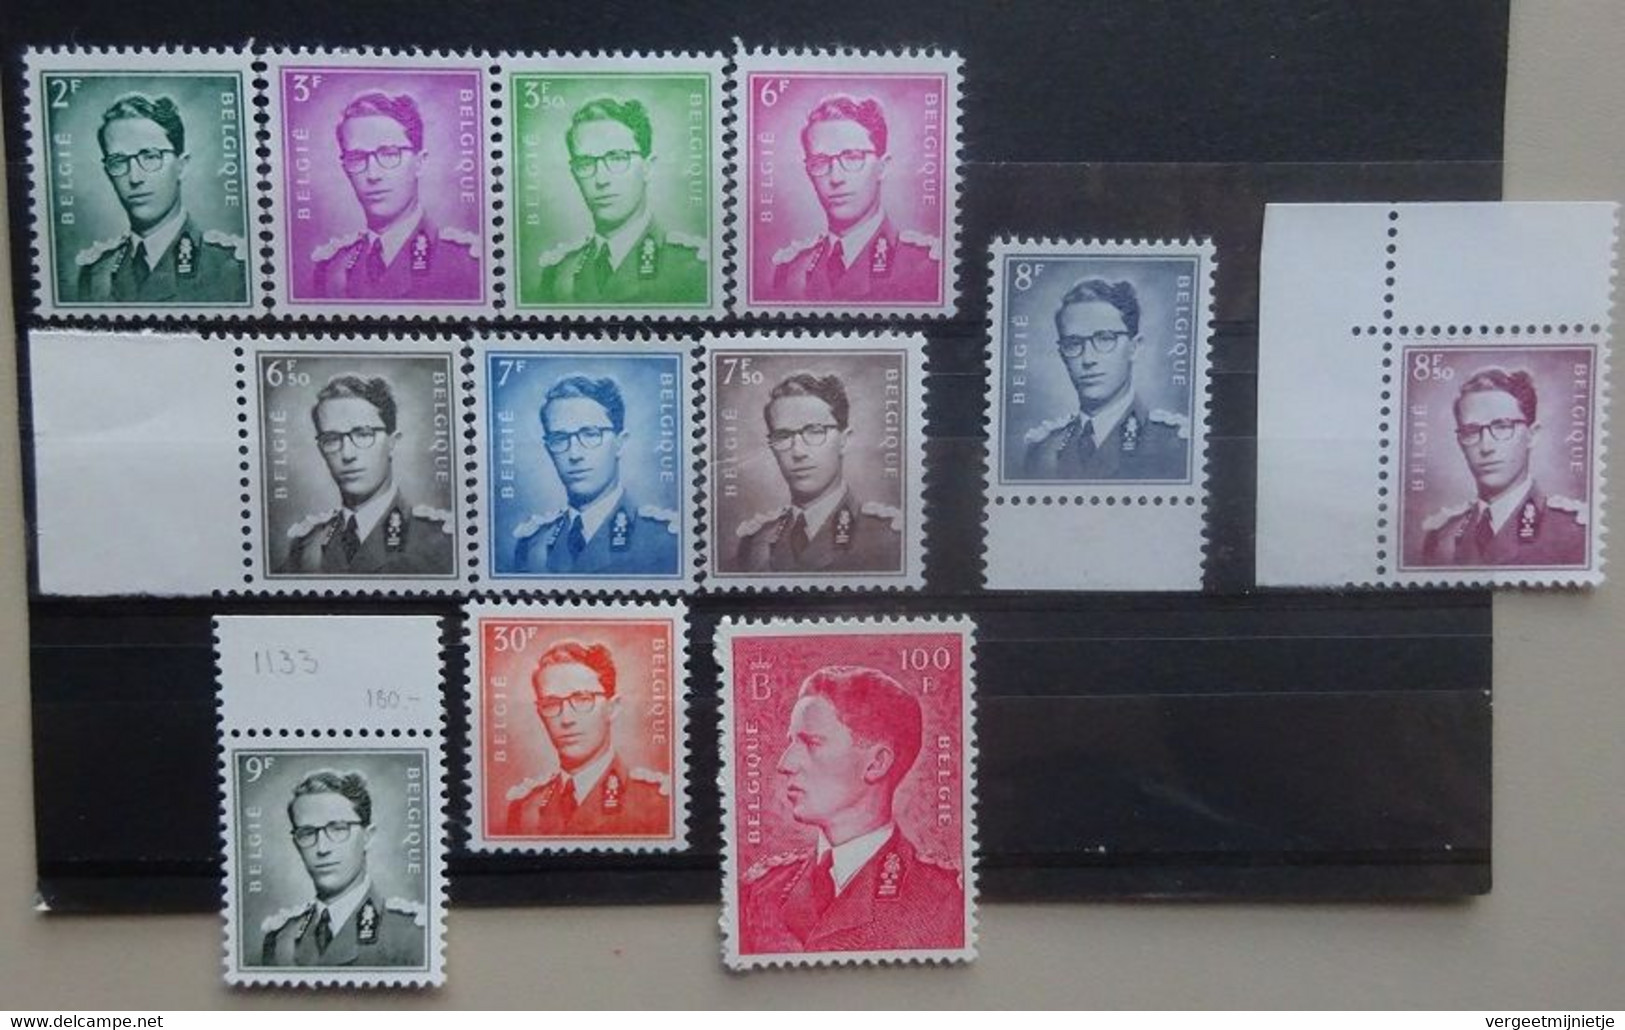 BELGIE  1958   Nr. 1066 - 1075    Koning Boudewijn       Postfris **    CW  365,00 - Unused Stamps